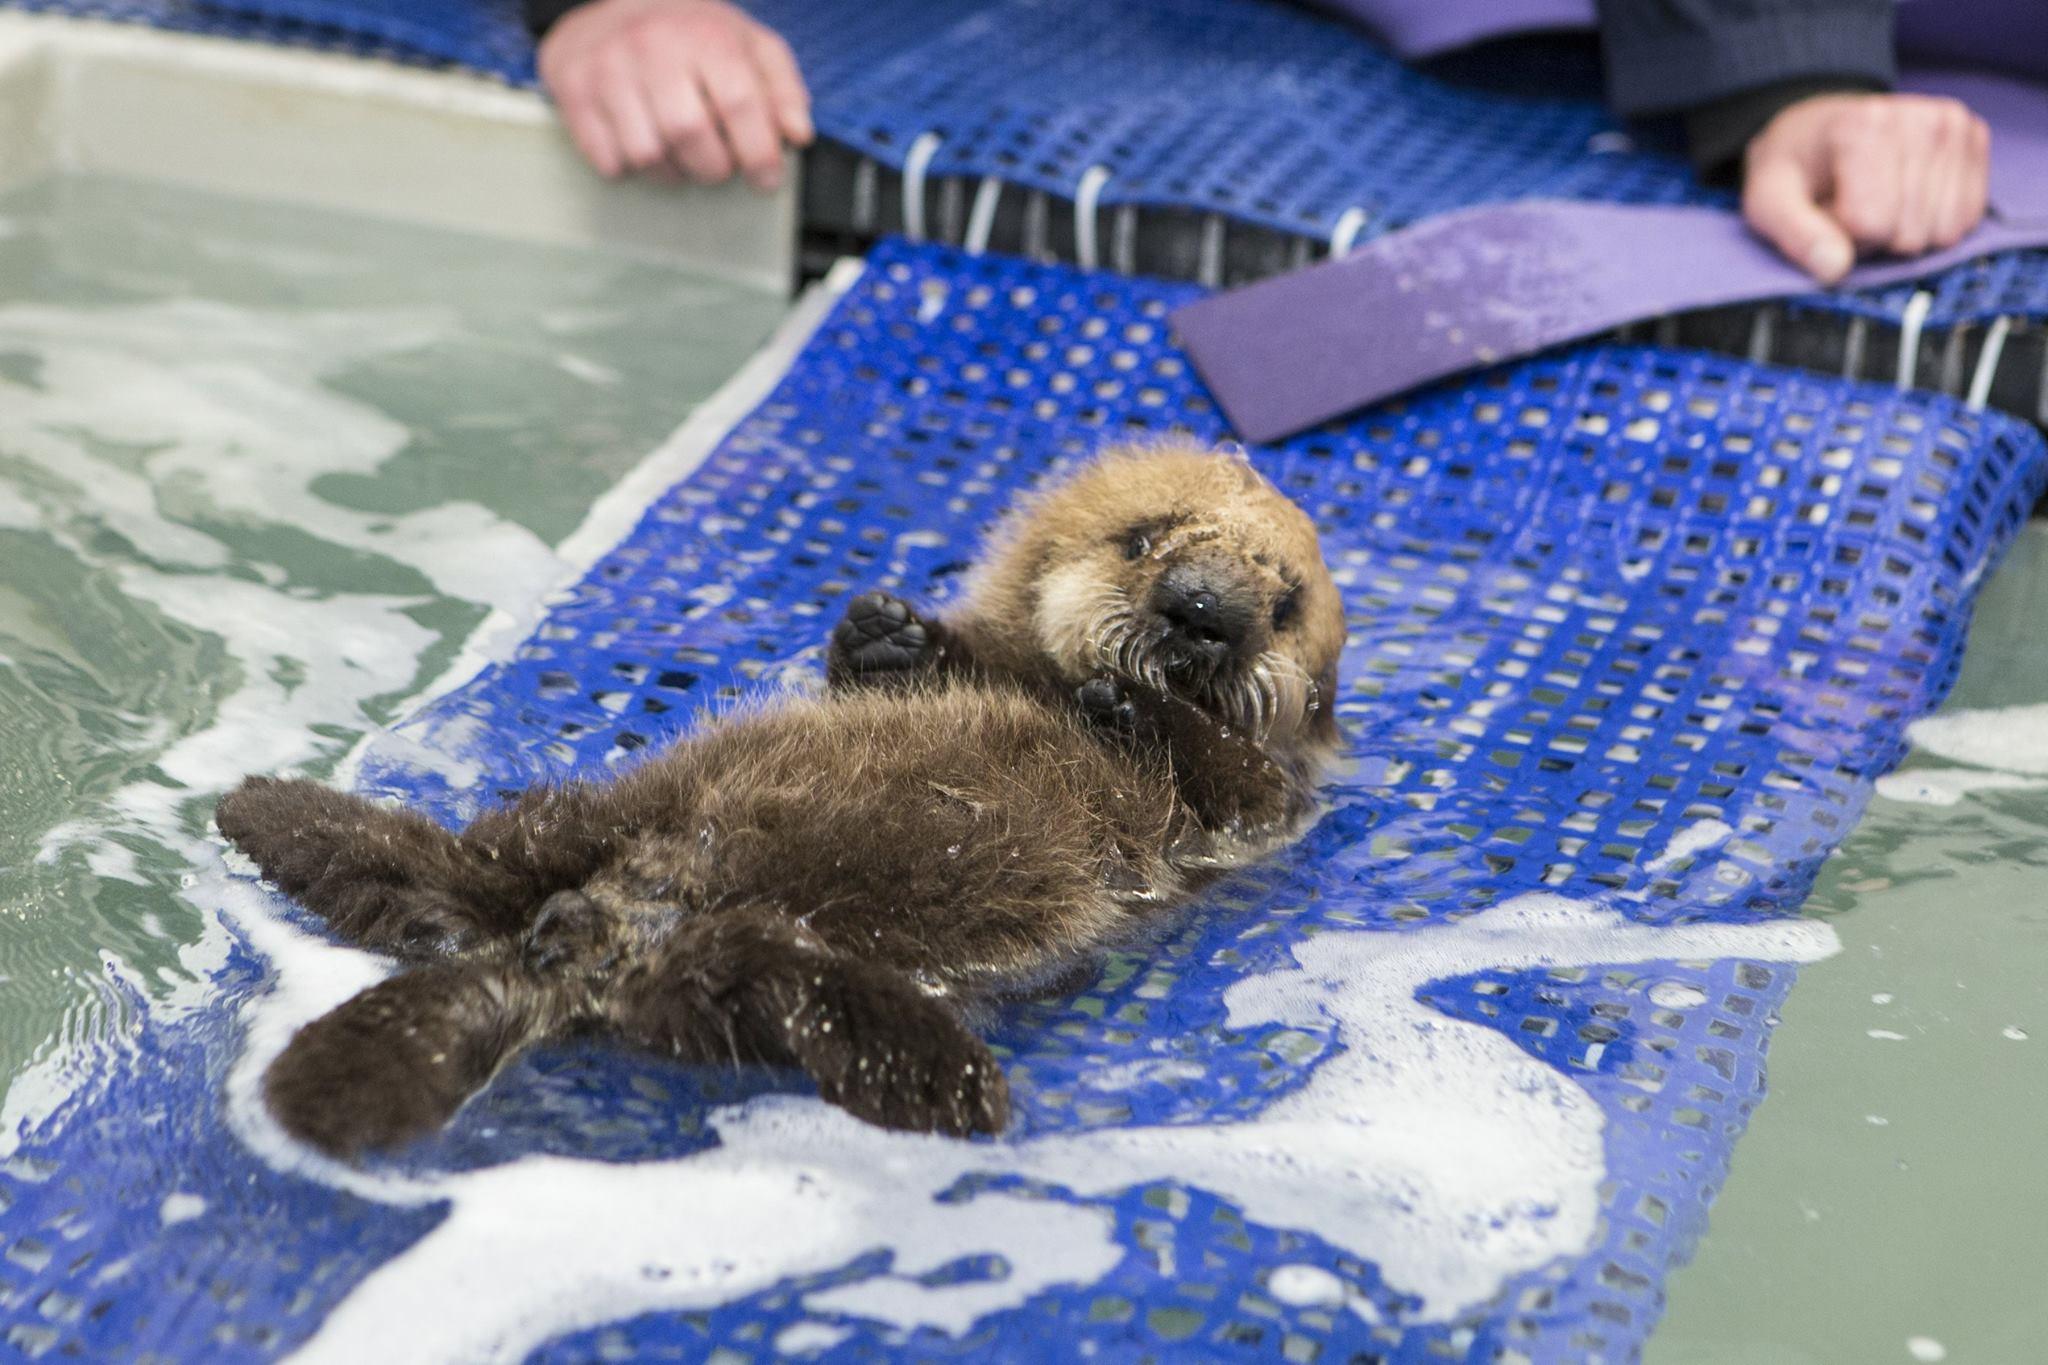 shedd aquarium otter experience